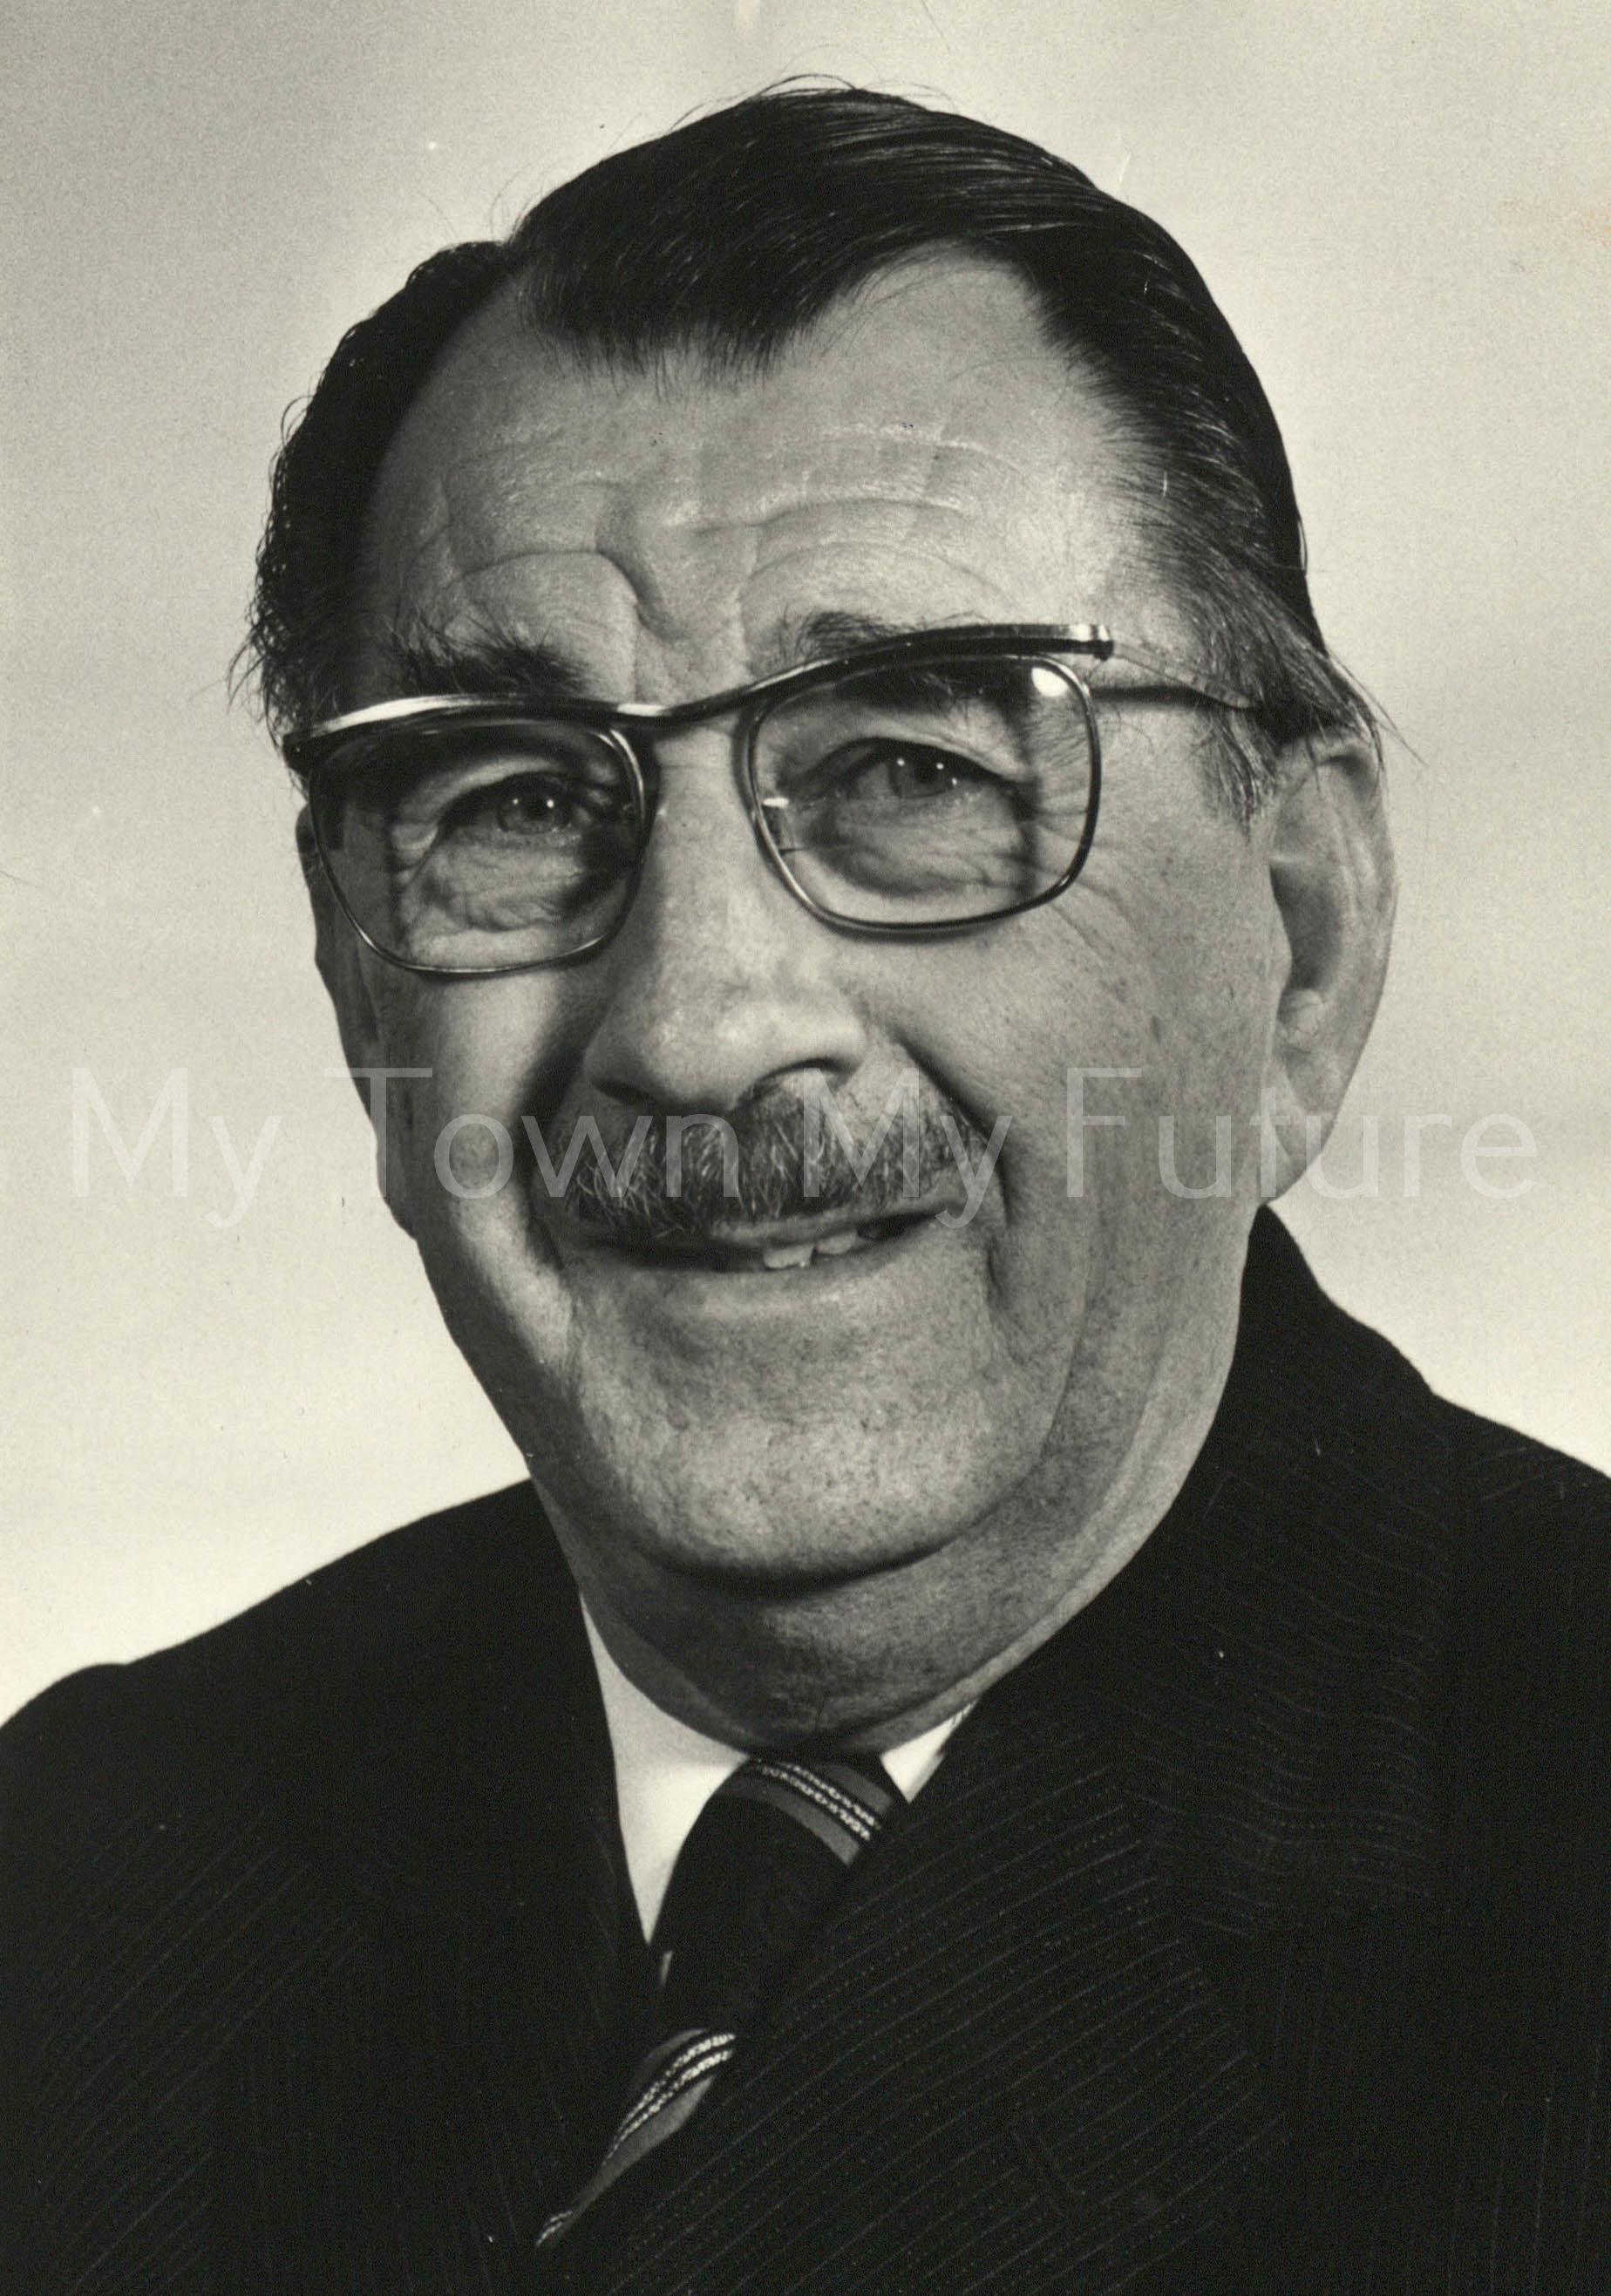 John B Woodham